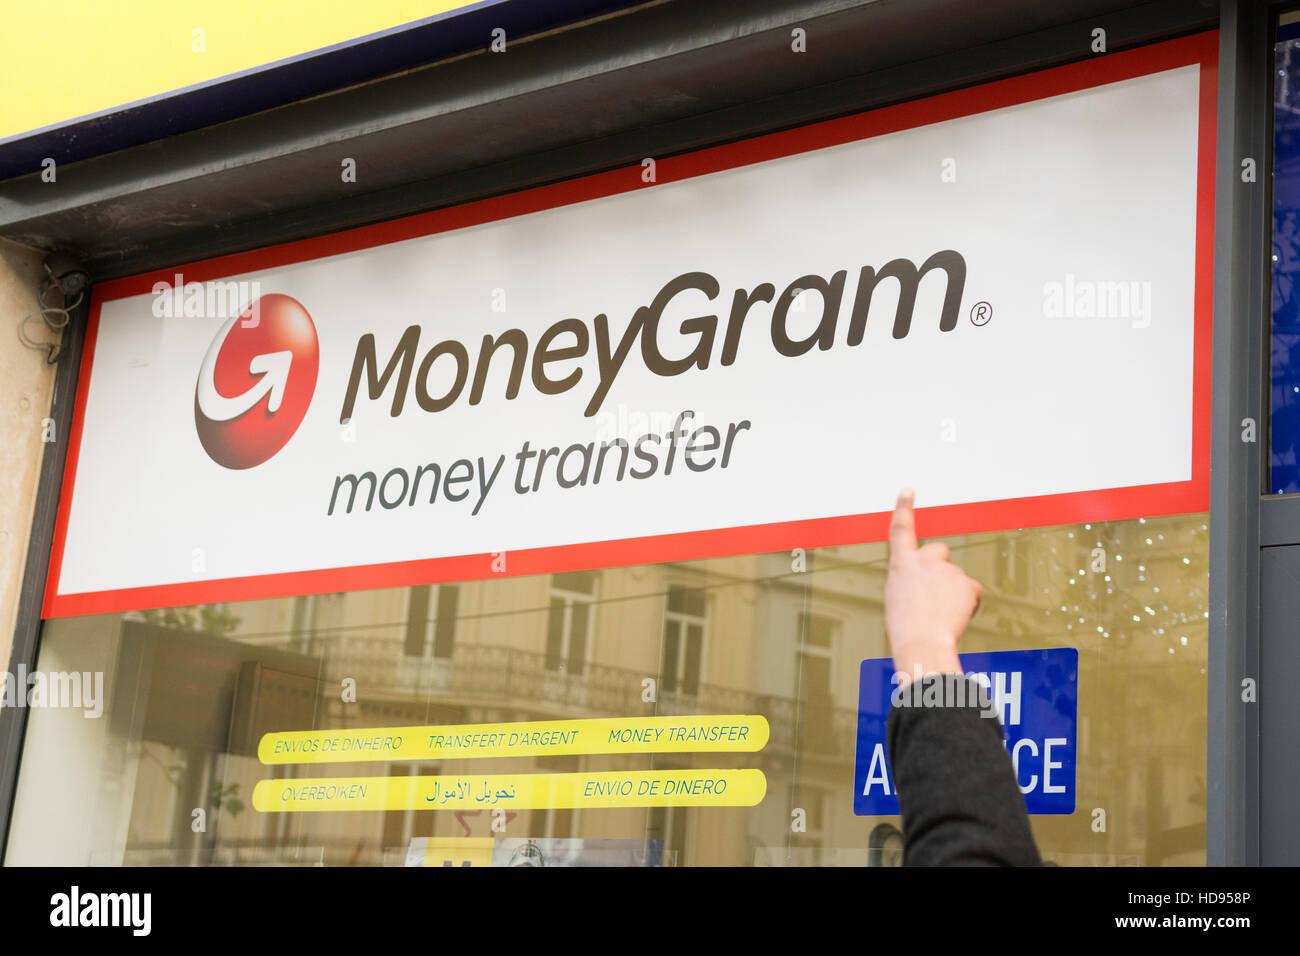 International Money Transfer Stock Photos Wiring To Haiti Moneygram Shop Image